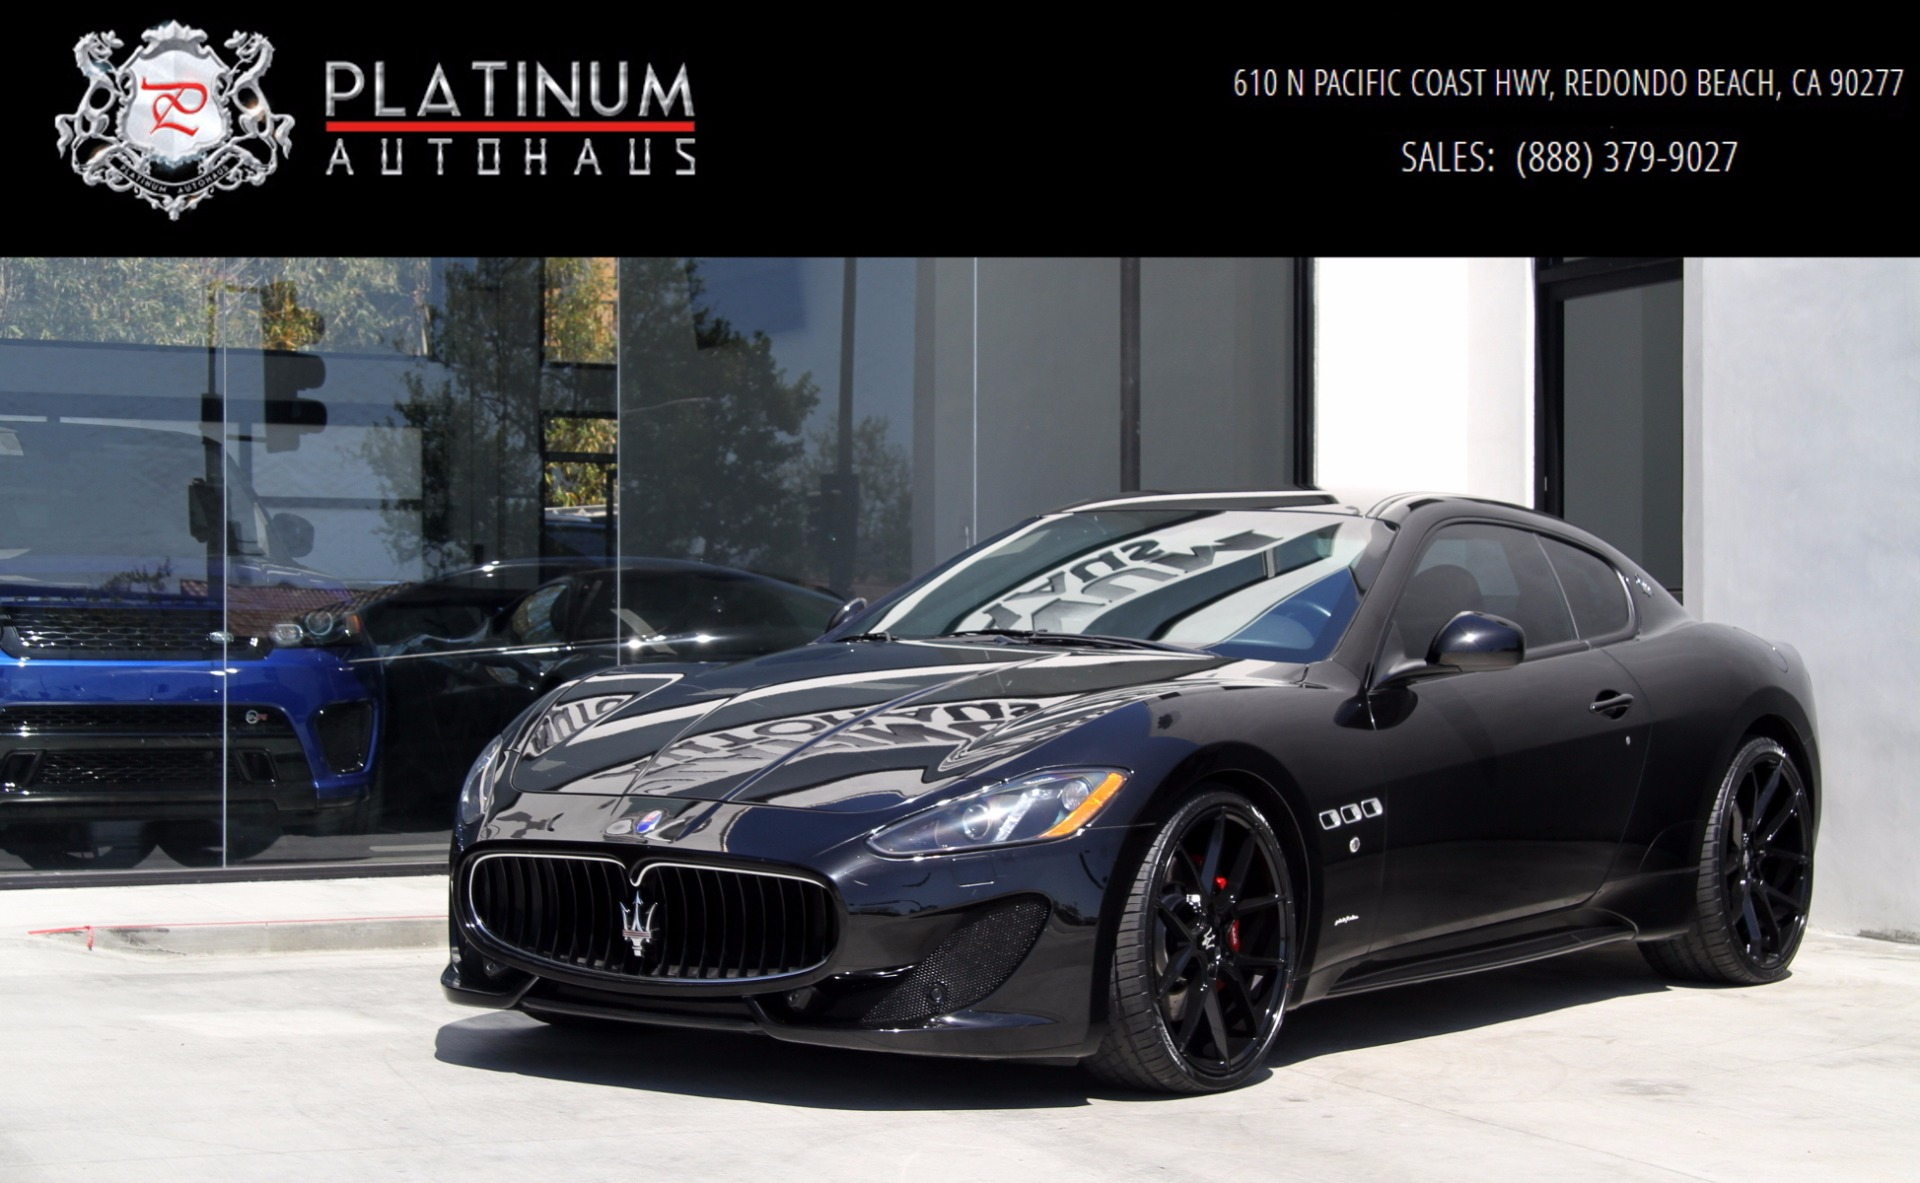 https://www.platinumautohaus.com/imagetag/12573/main/l/Used-2013-Maserati-GranTurismo-Sport.jpg